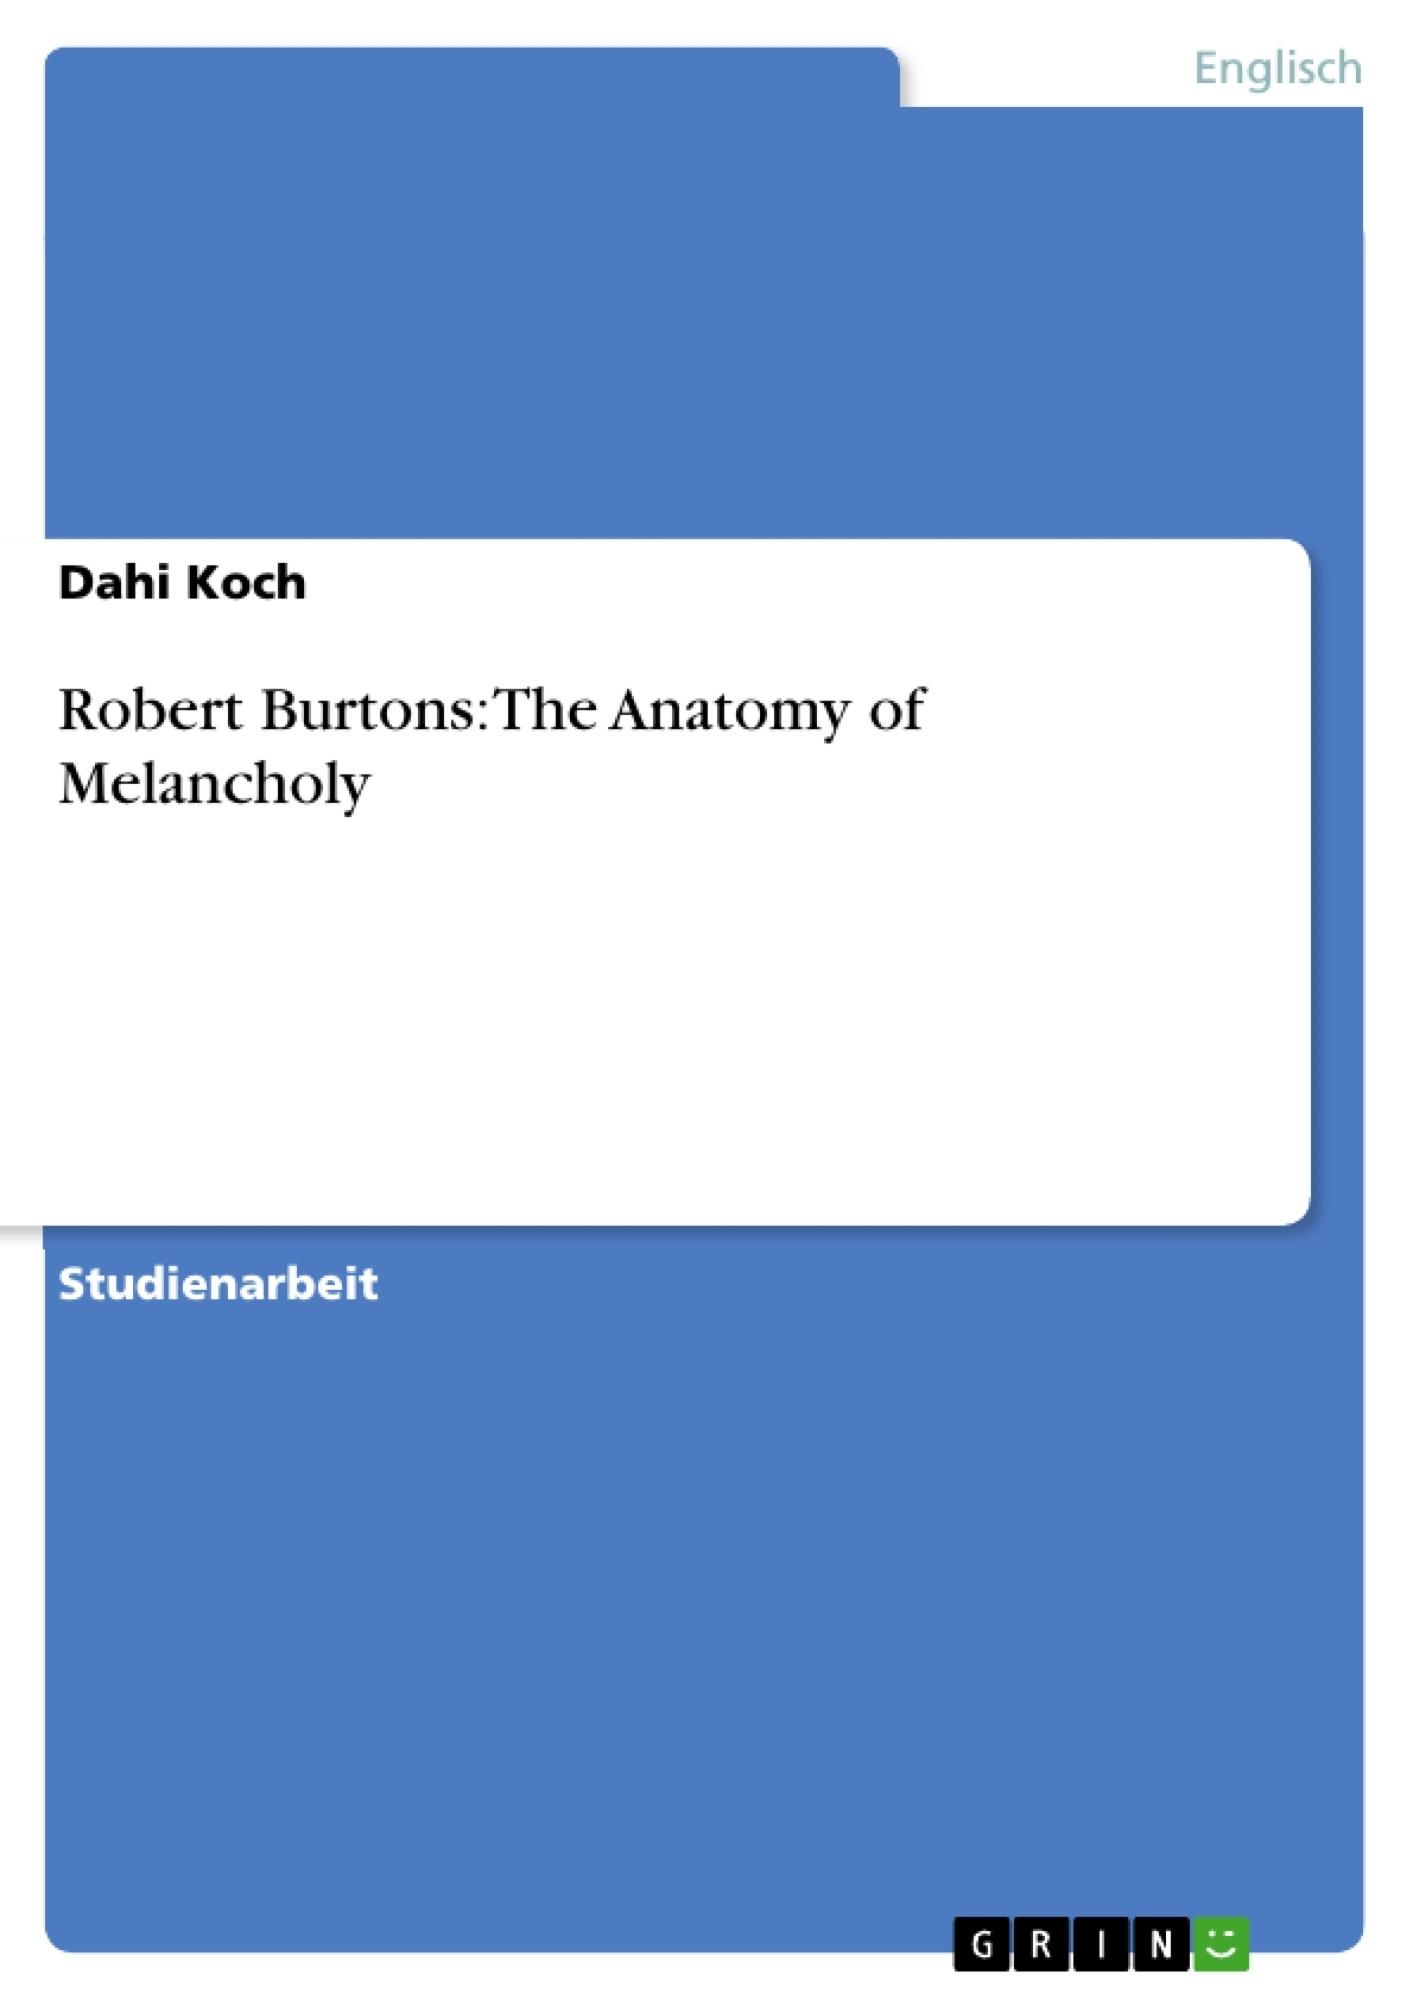 Titel: Robert Burtons: The Anatomy of Melancholy